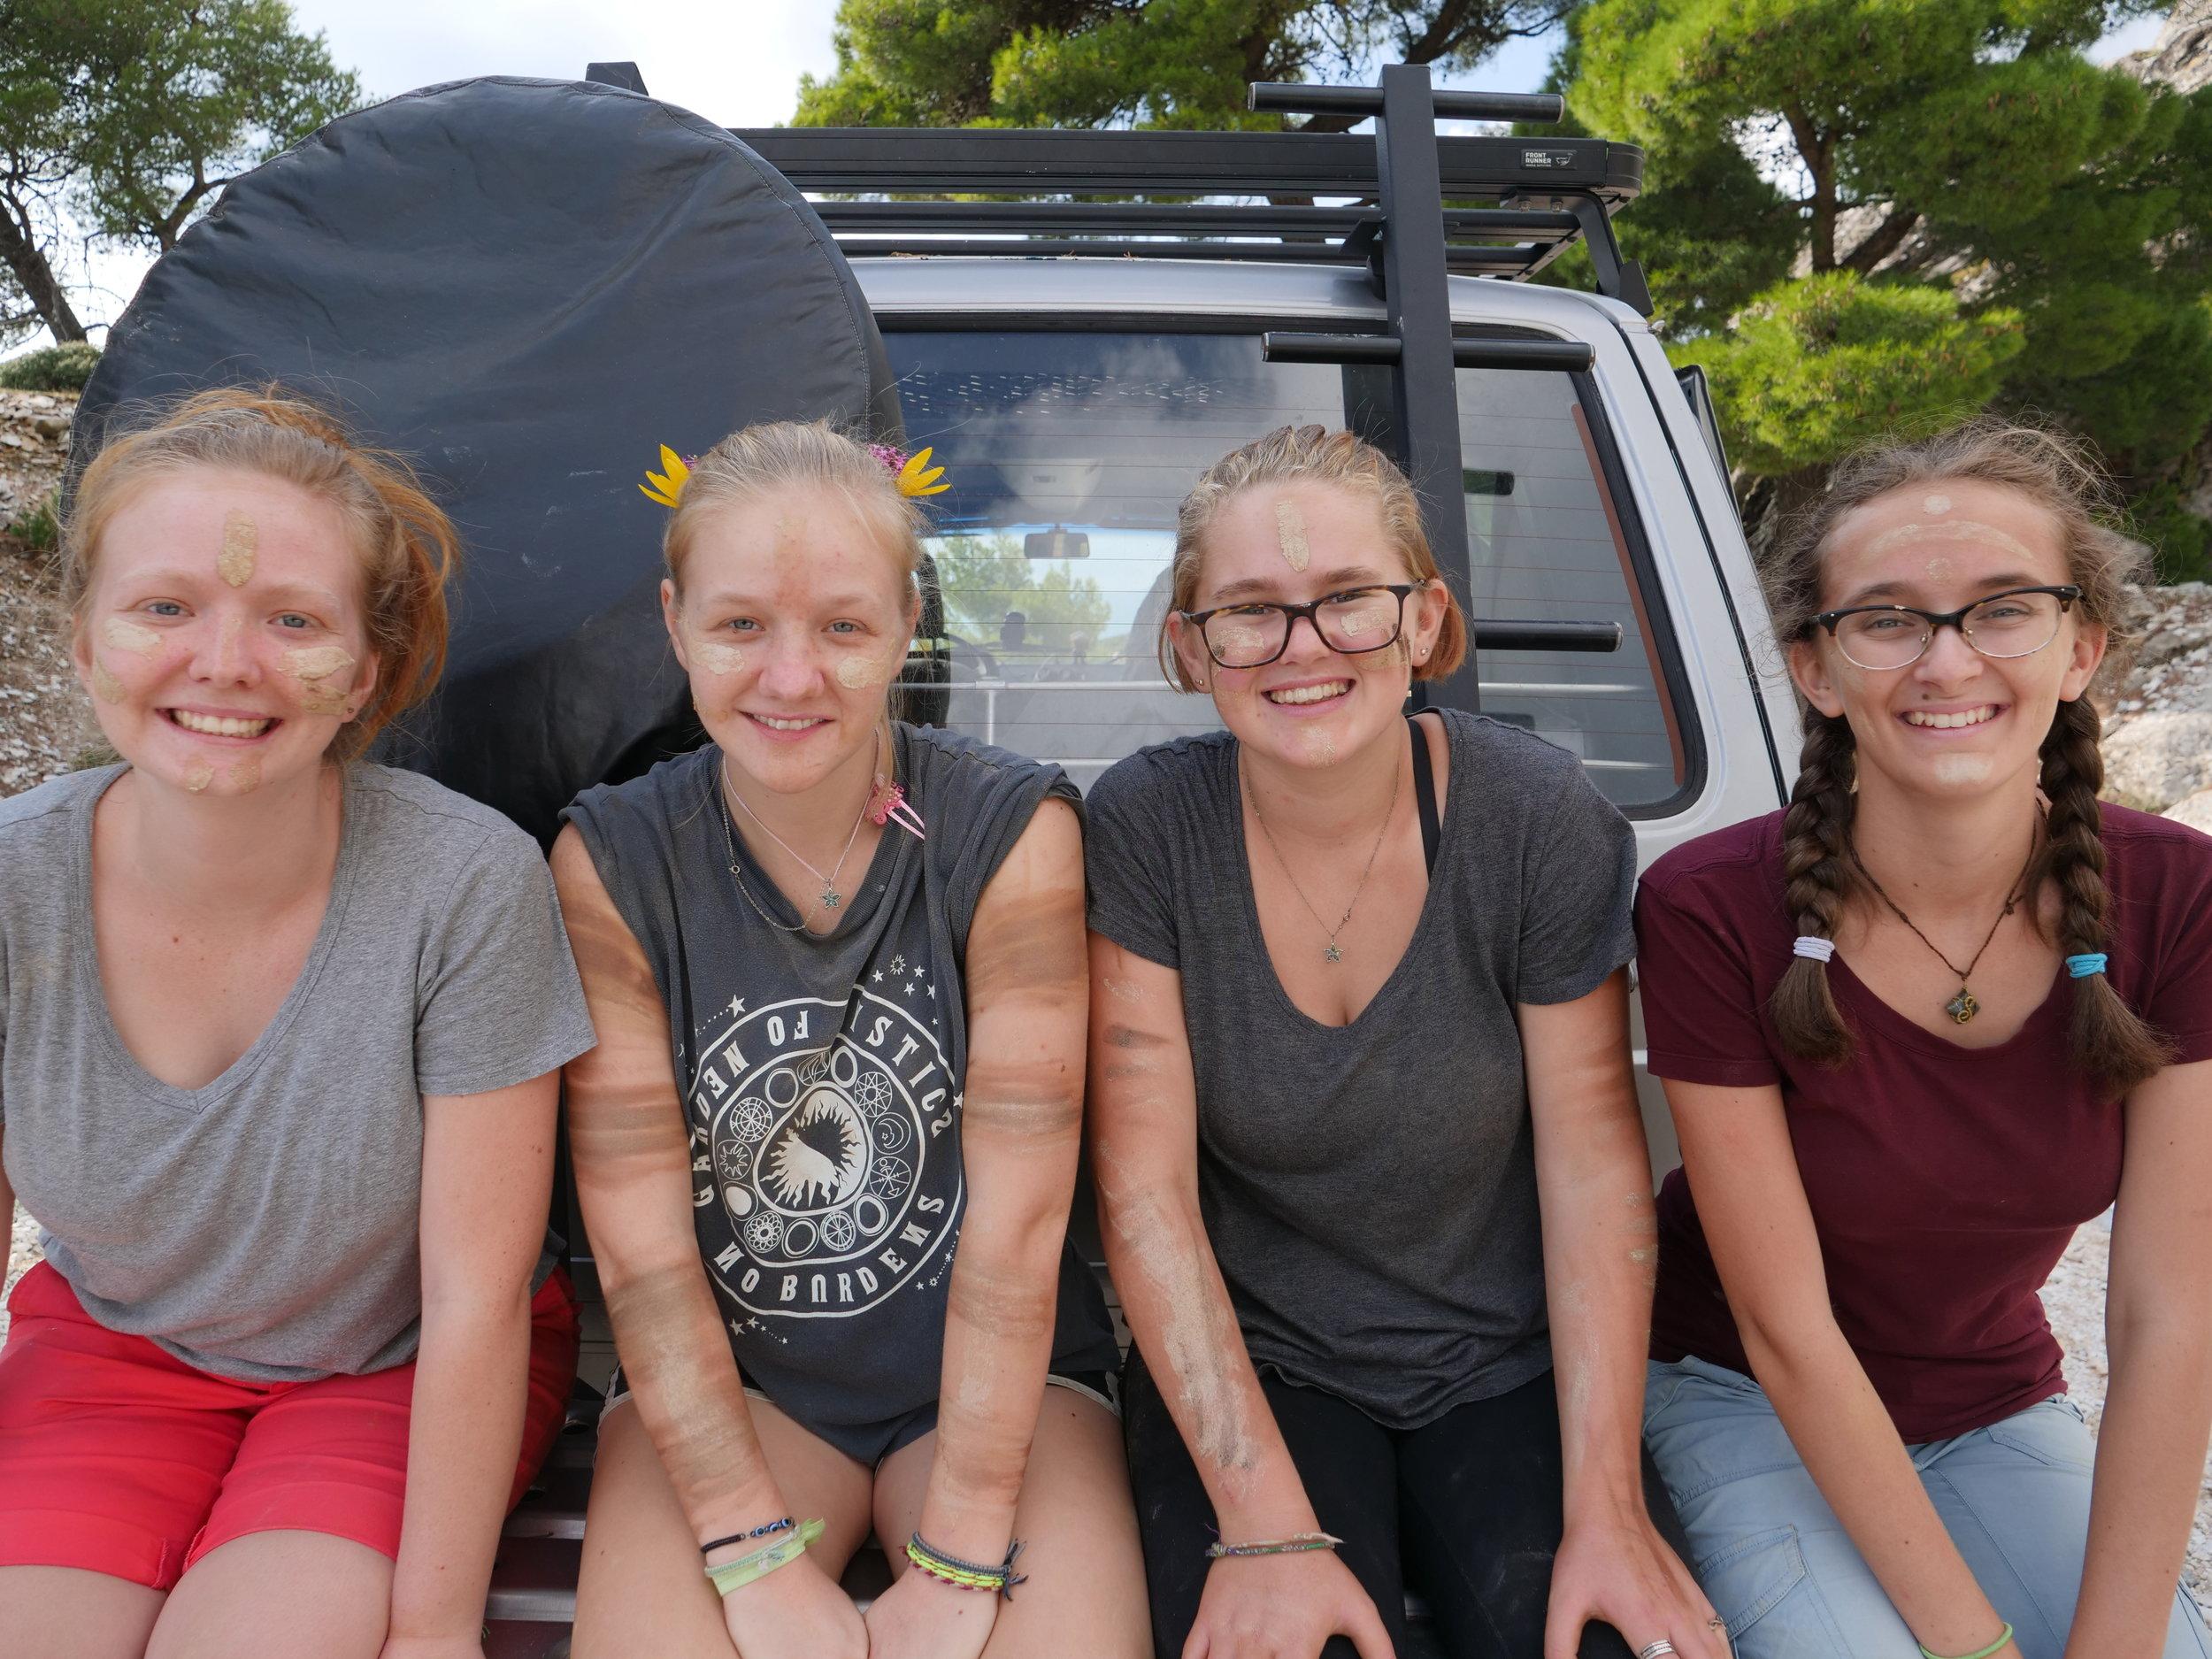 4 big girls with dirt.JPG